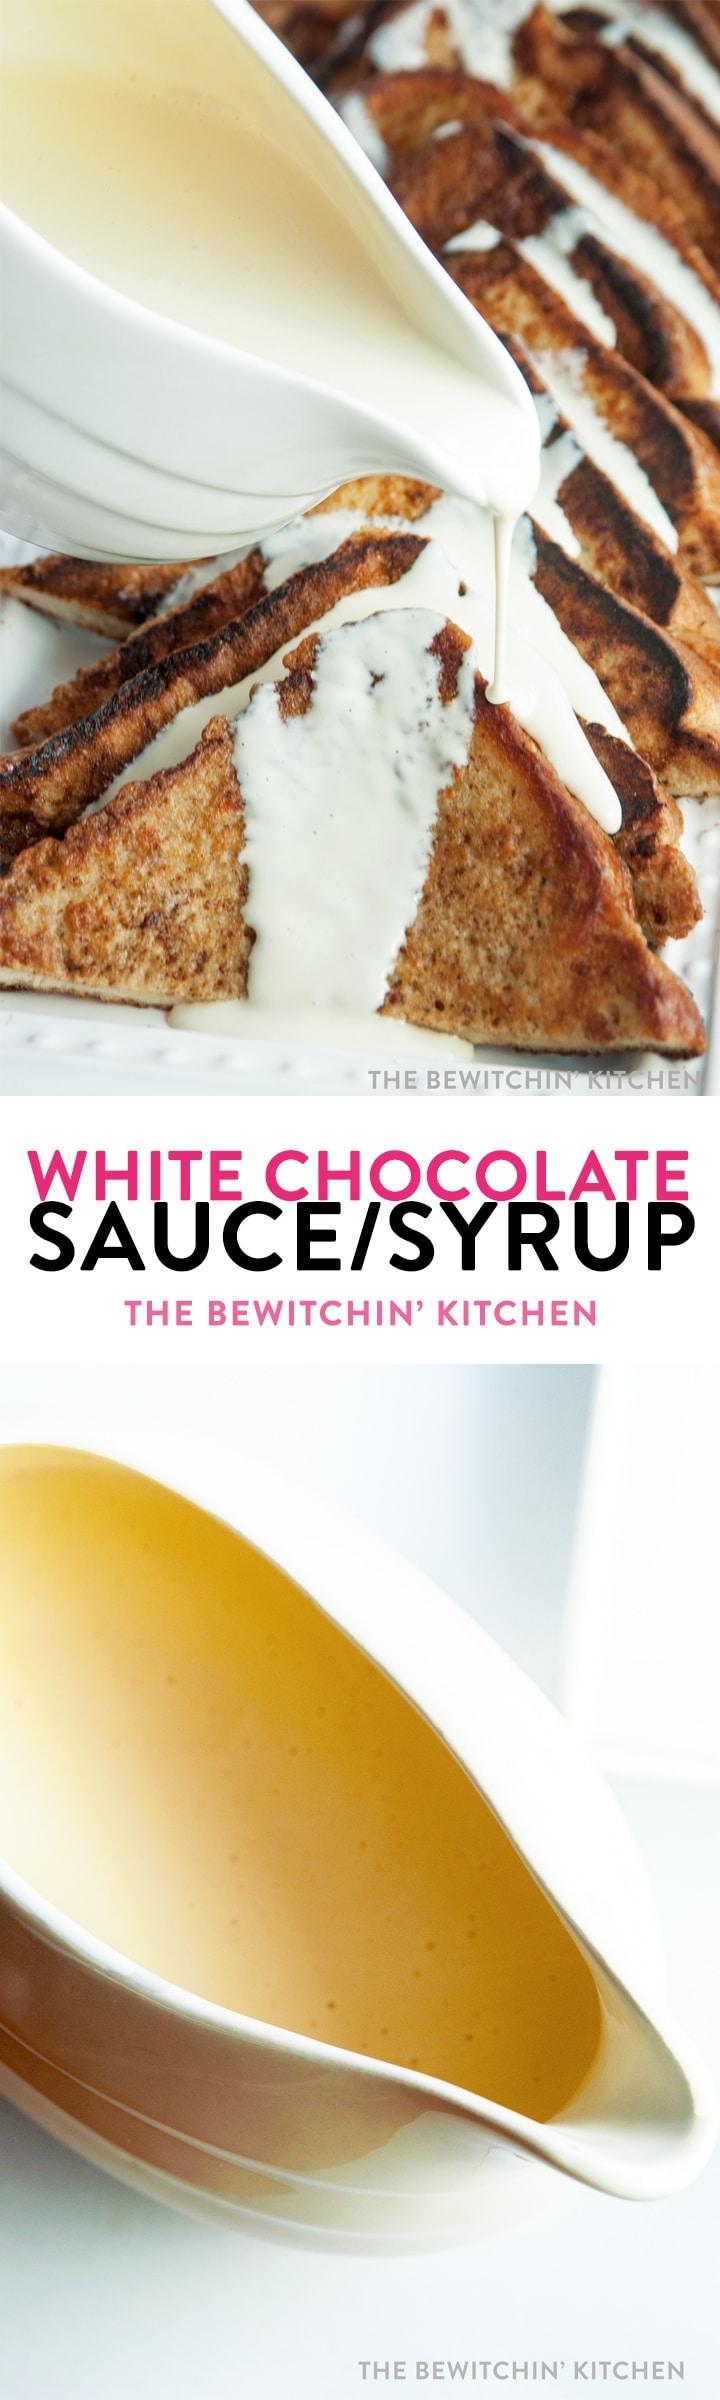 White Chocolate Sauce | The Bewitchin' Kitchen